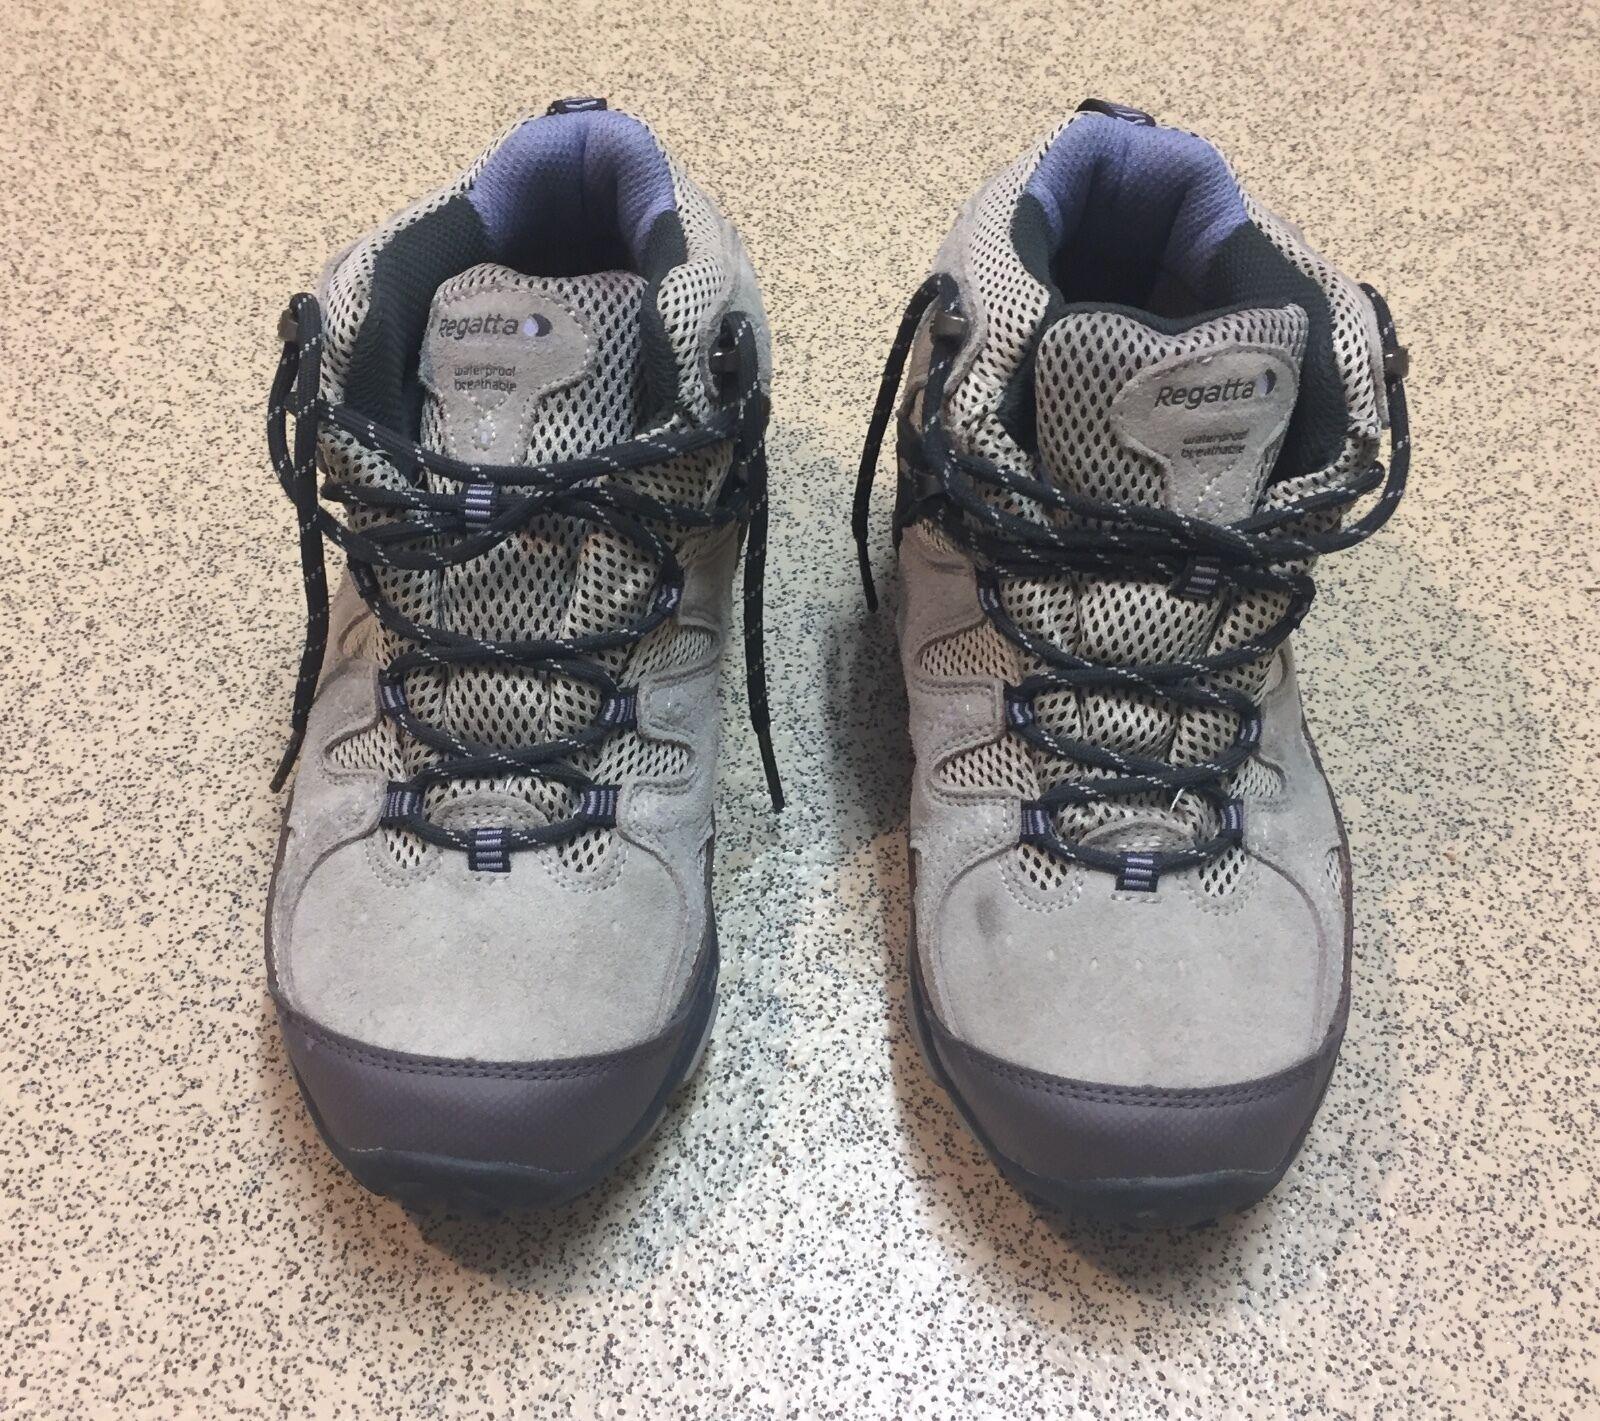 Regatta boots (size uk 4)